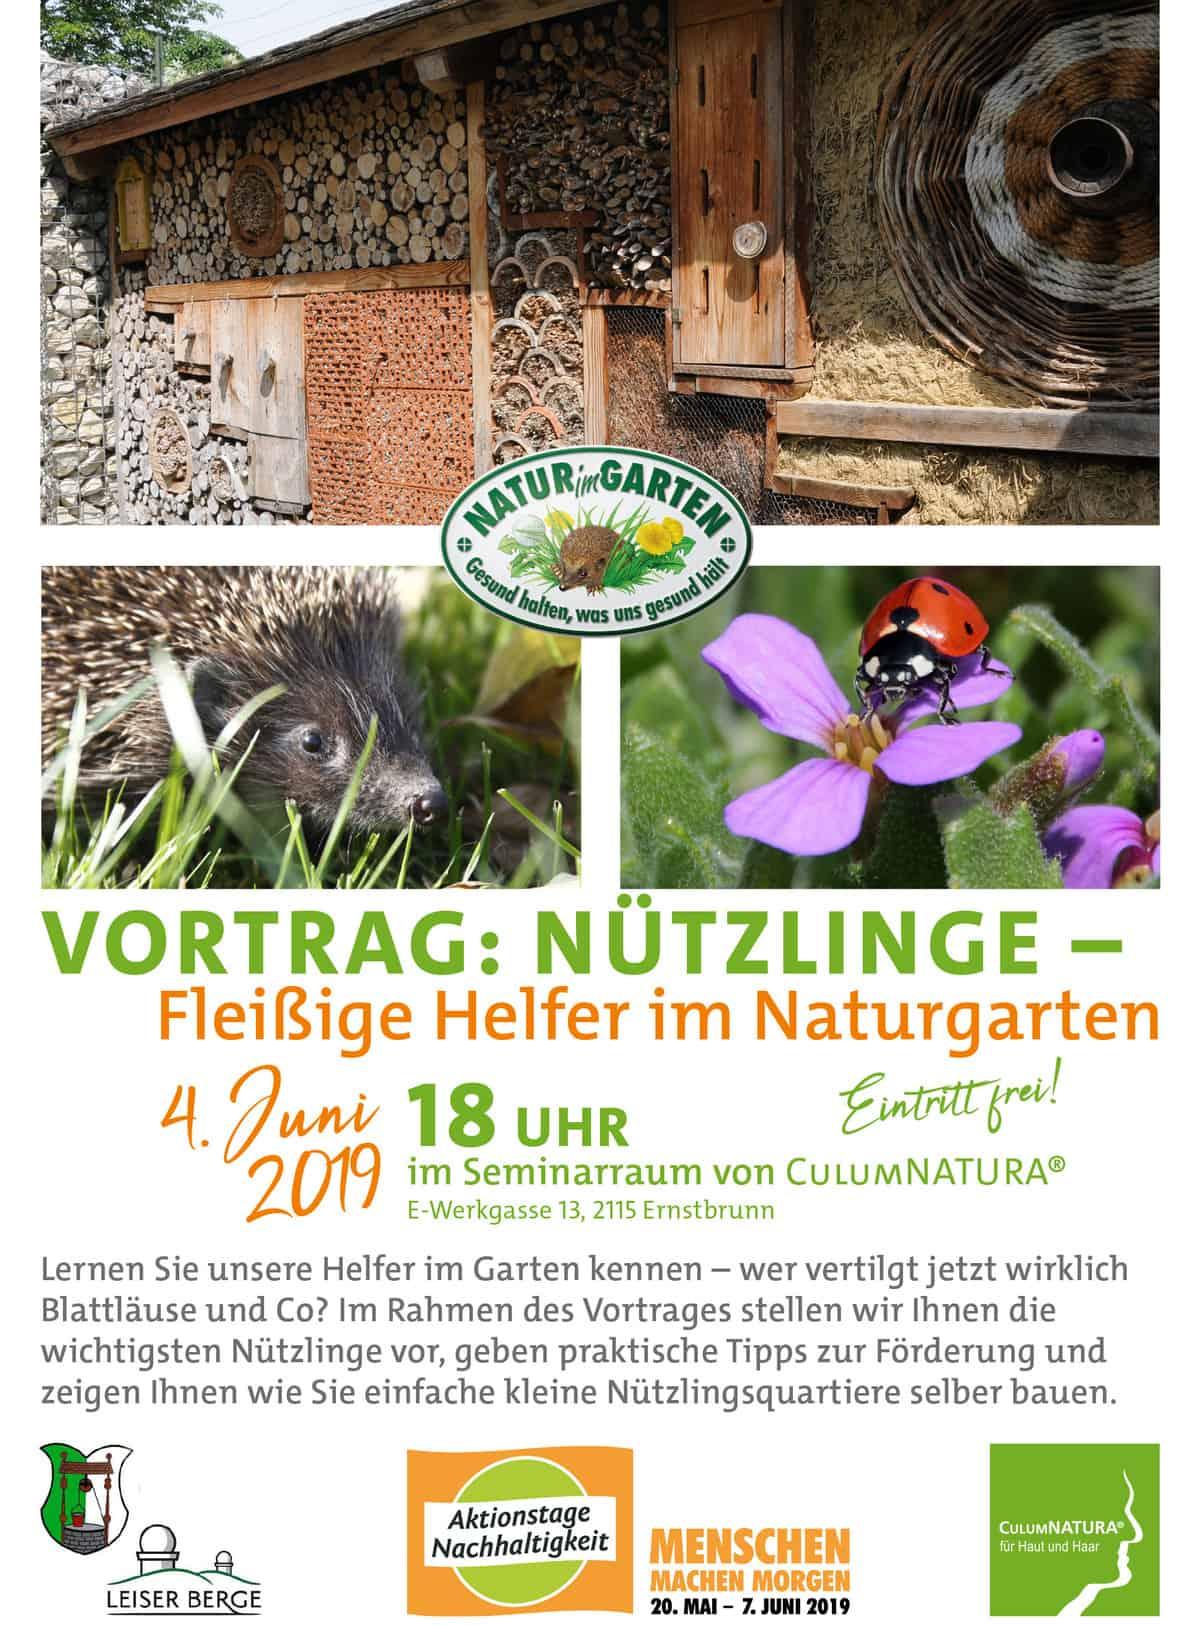 Nützlinge - Fleißige Helfer im Naturgarten 206